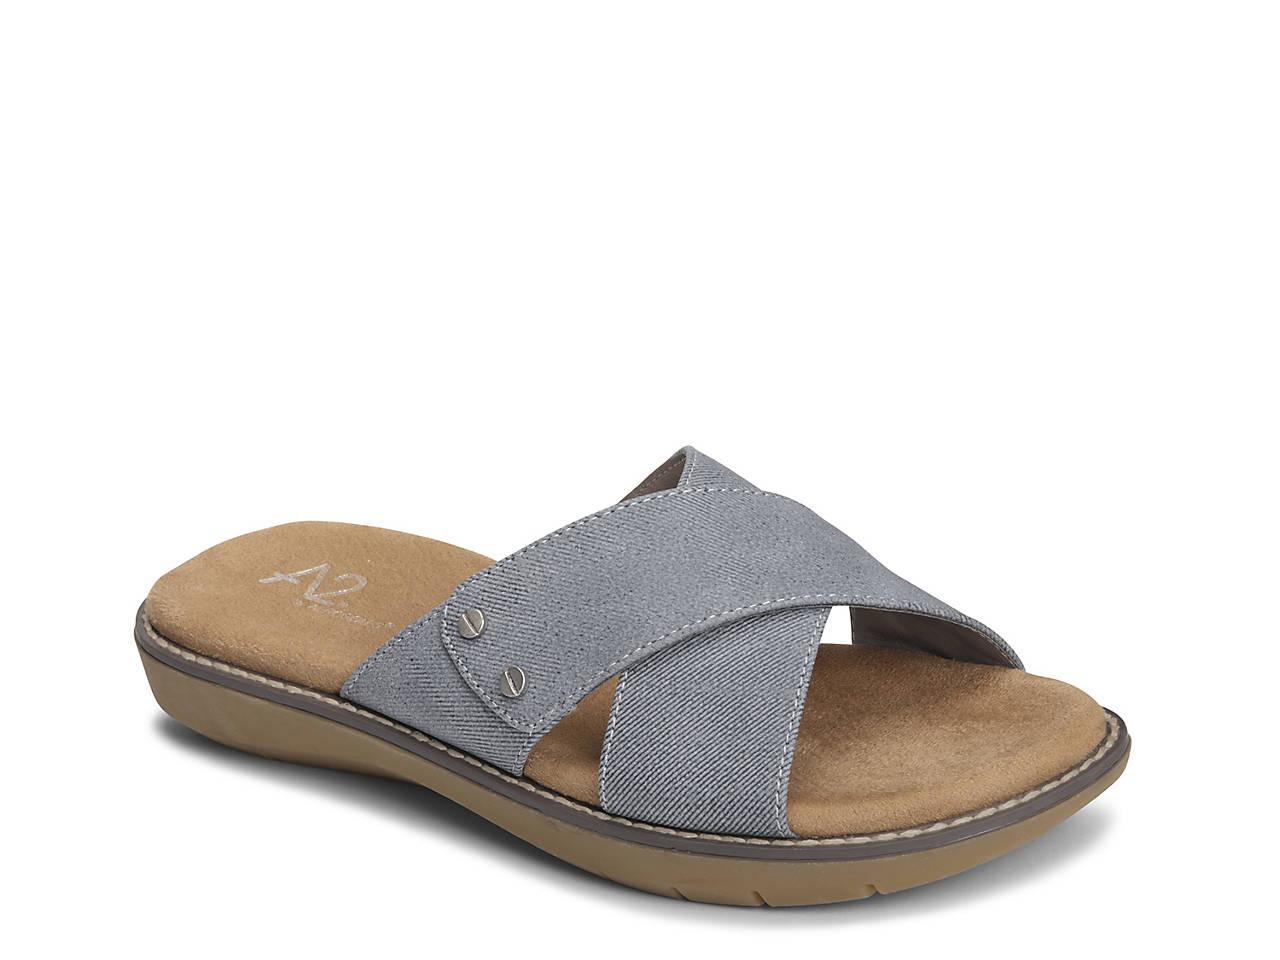 A2 by Aerosoles Cool Breeze ... Women's Slide Sandals tumblr online HFA9j96vY